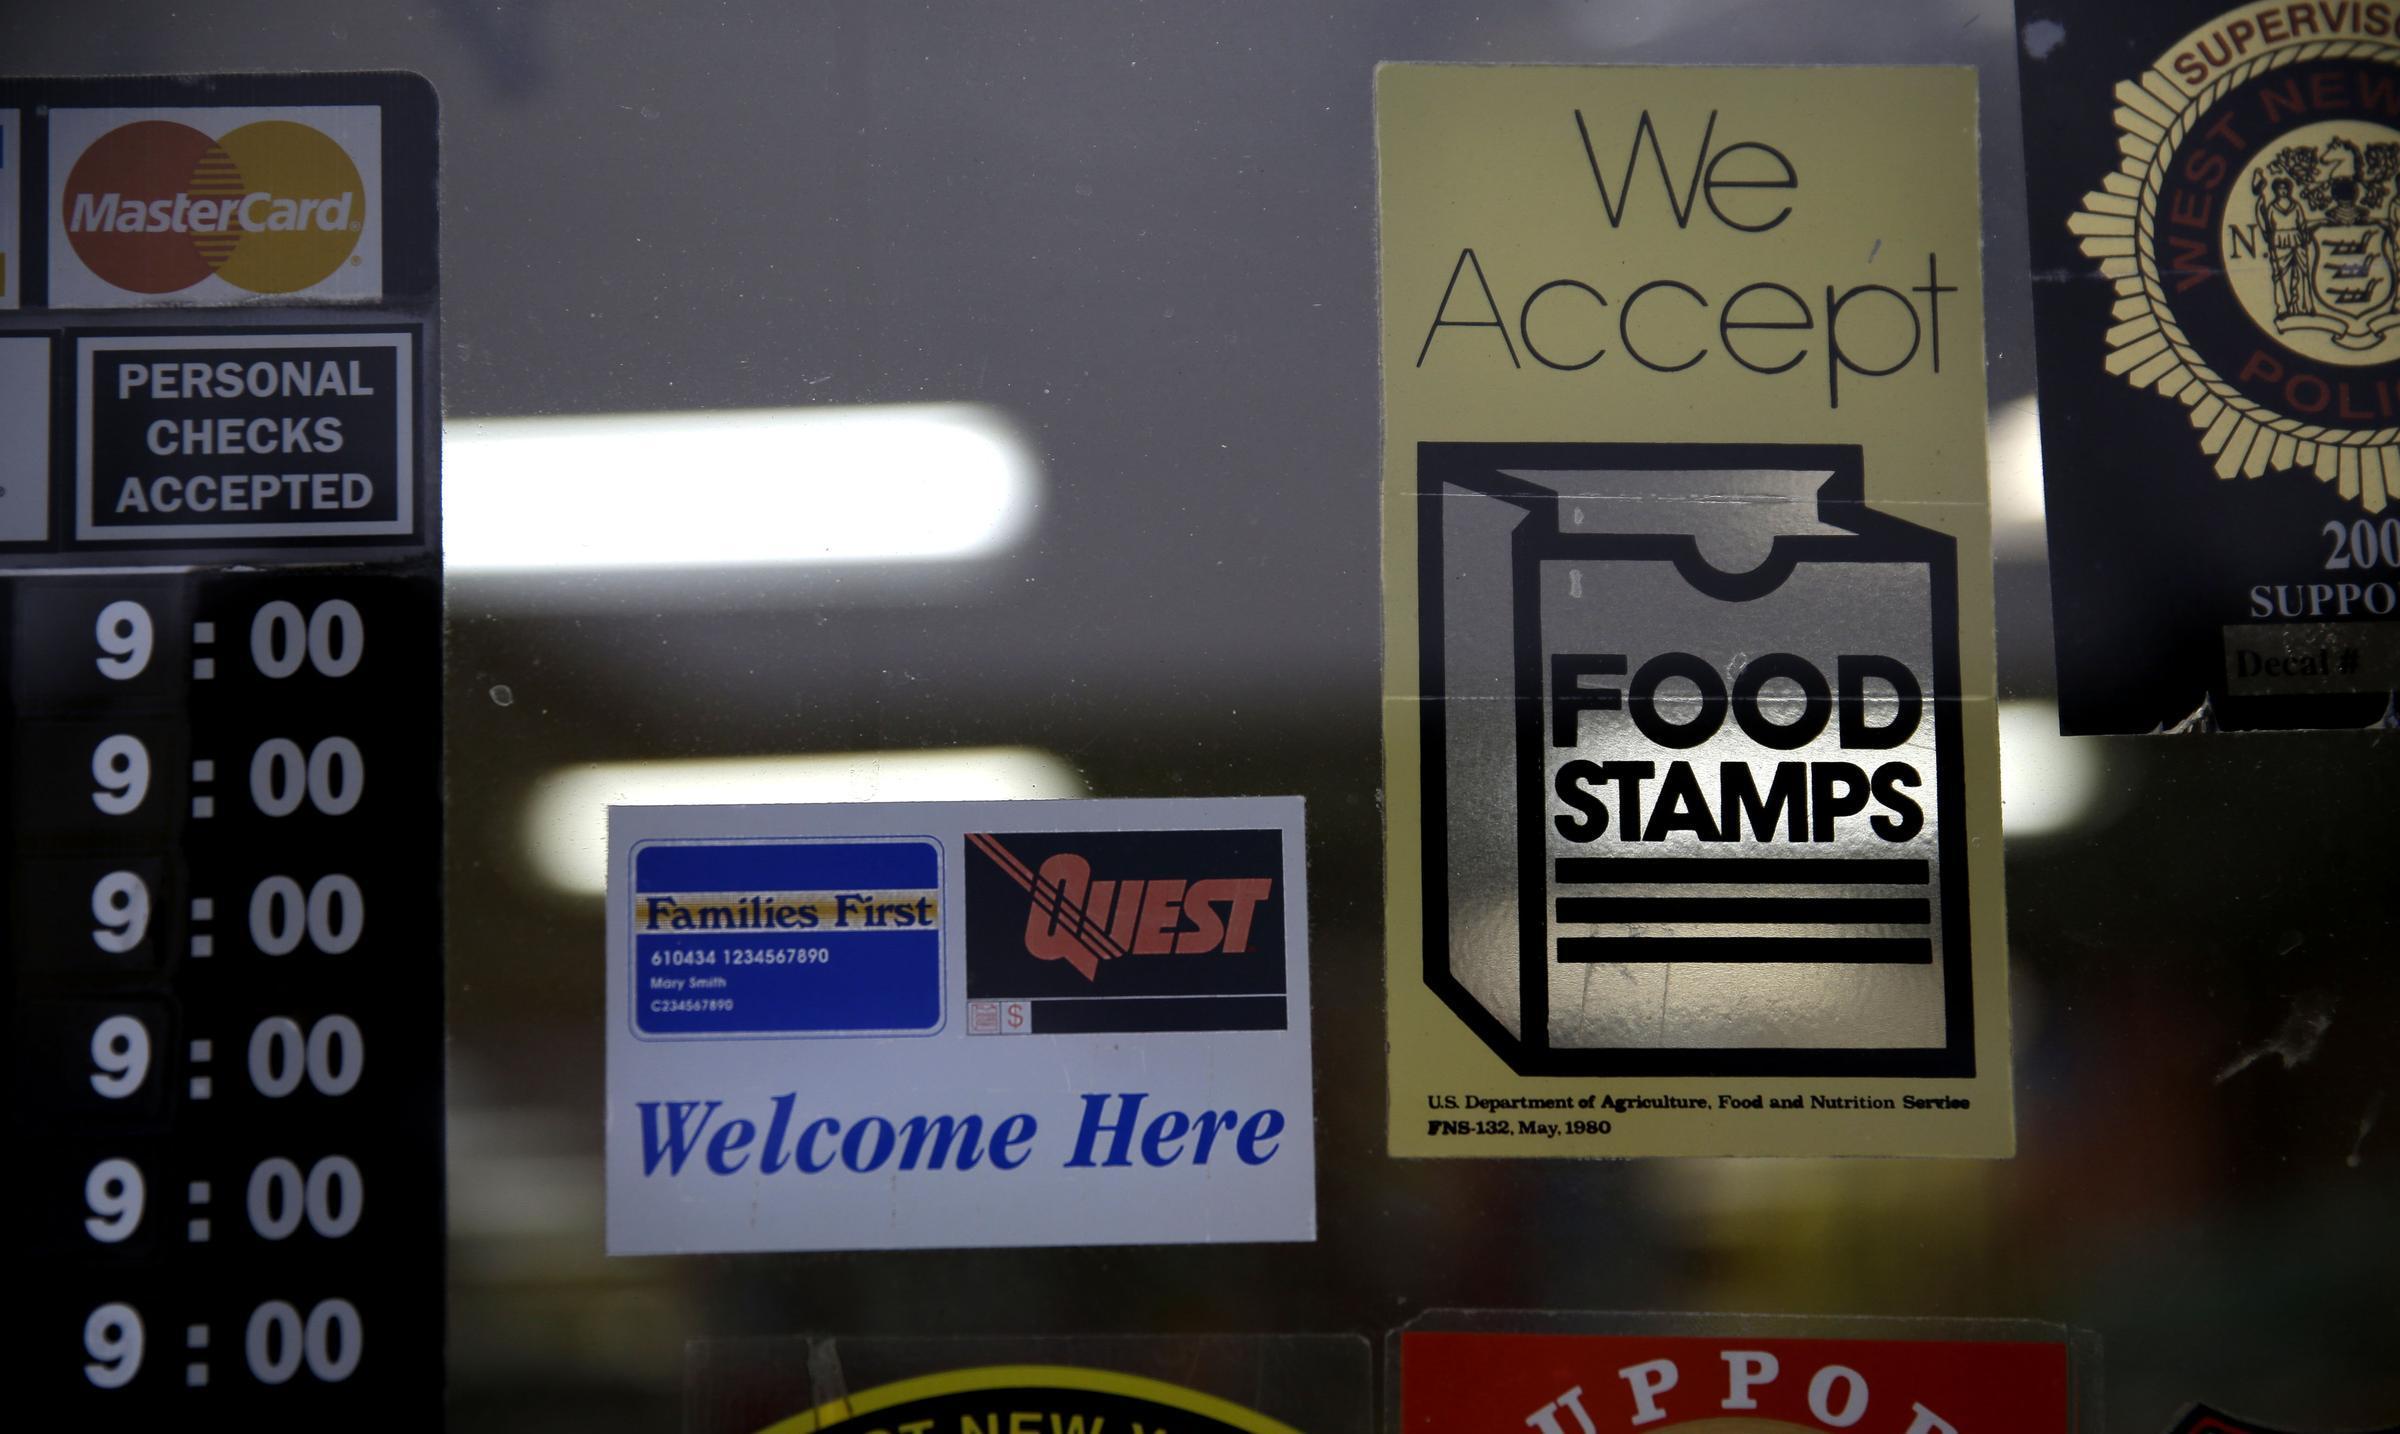 Census Bureau: 216% Of Us Children—15,931,000on Food Stamps In 2014